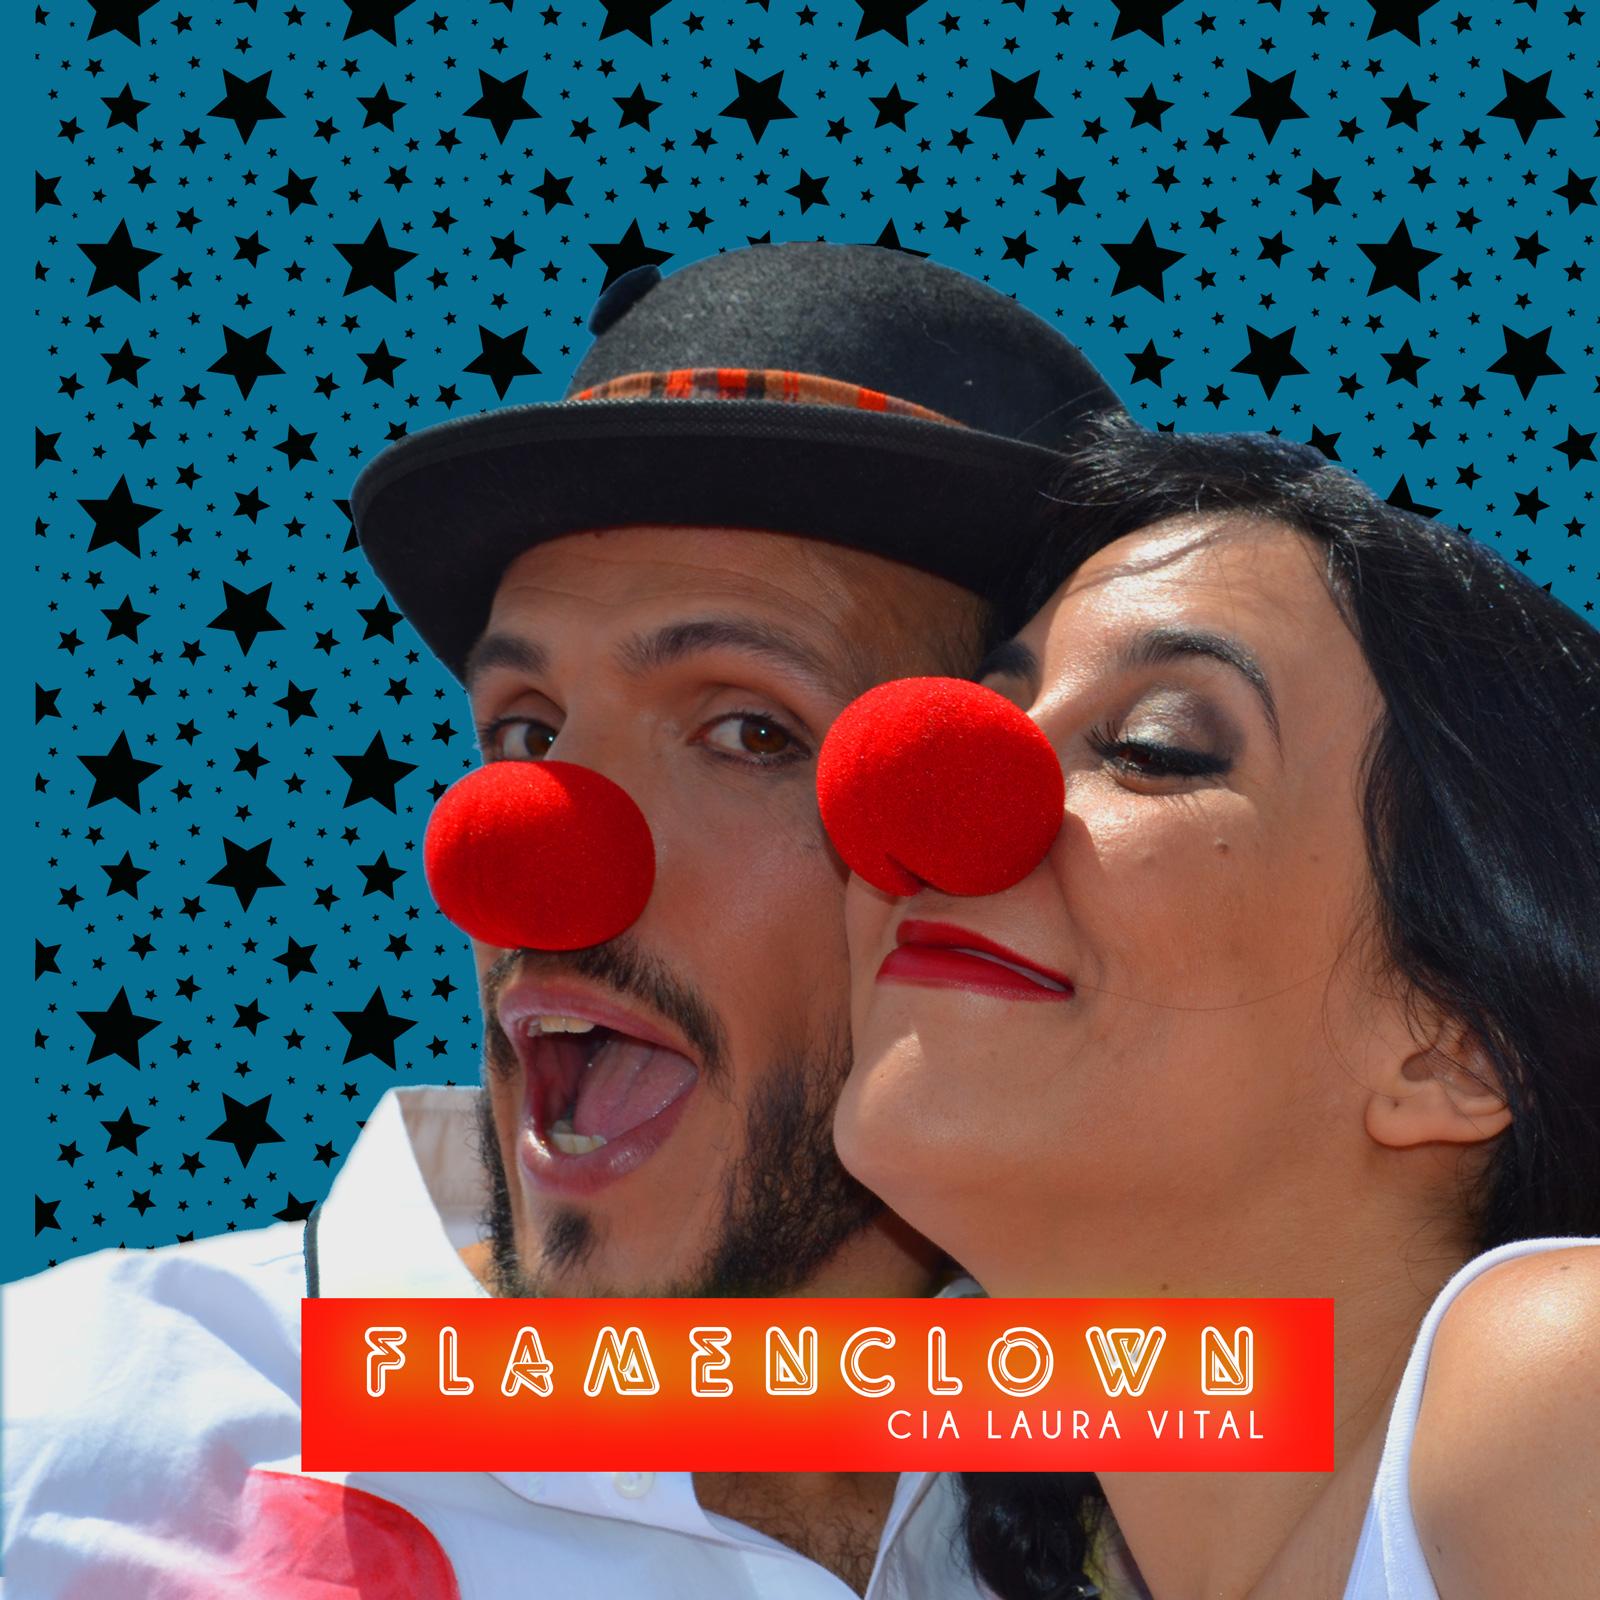 Poster Flamenclown de Laura Vital y Fran Caballero